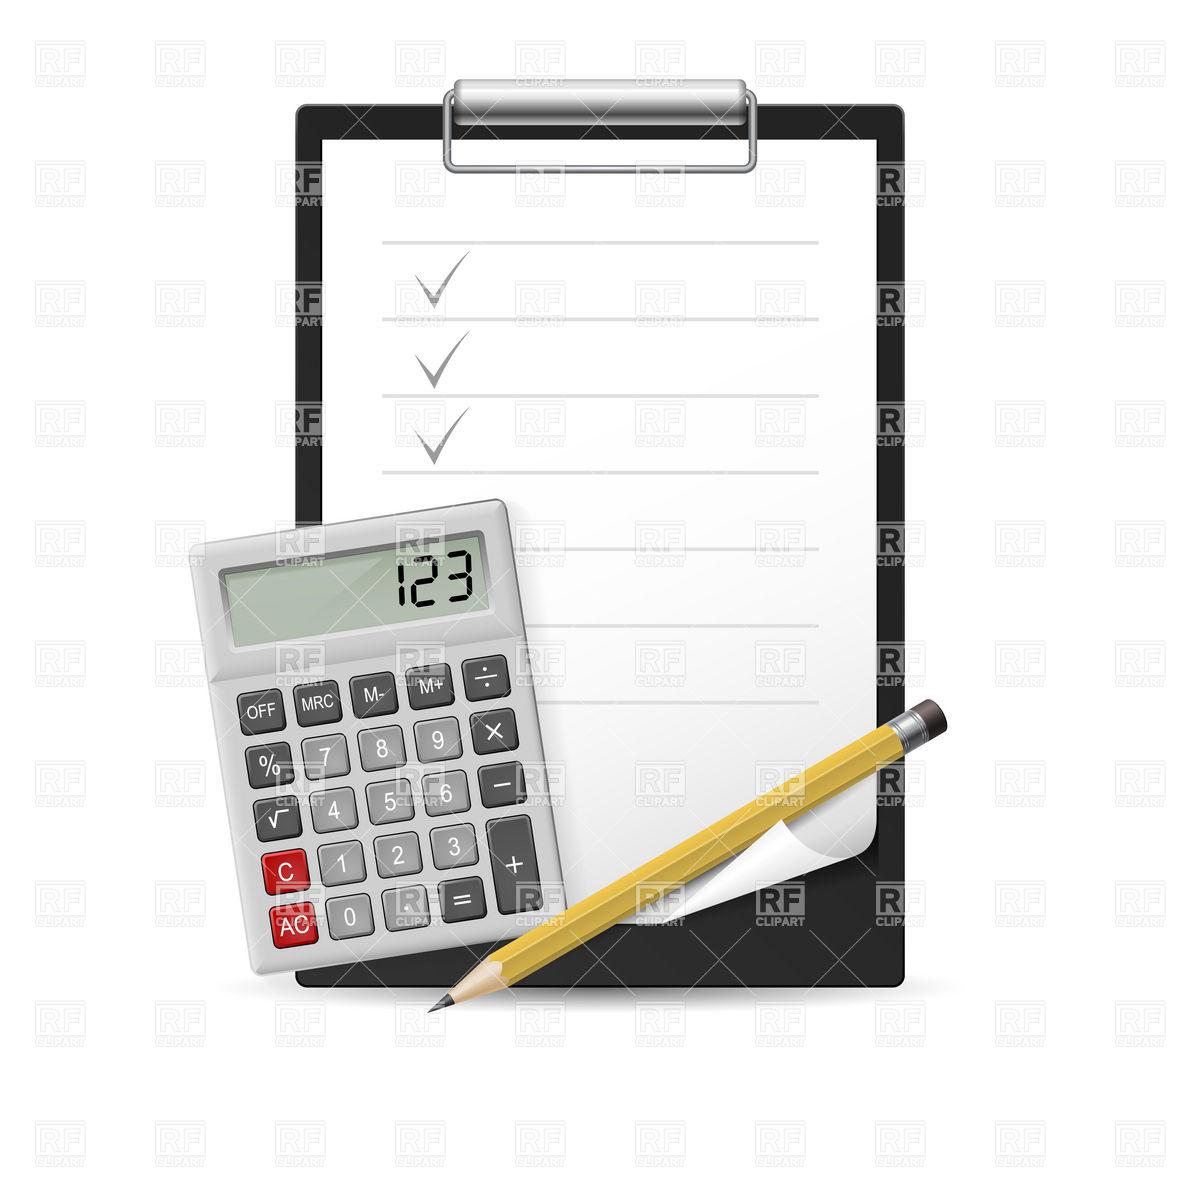 1200x1200 Clipboard With Checklist, Pencil And Calculator Vector Image